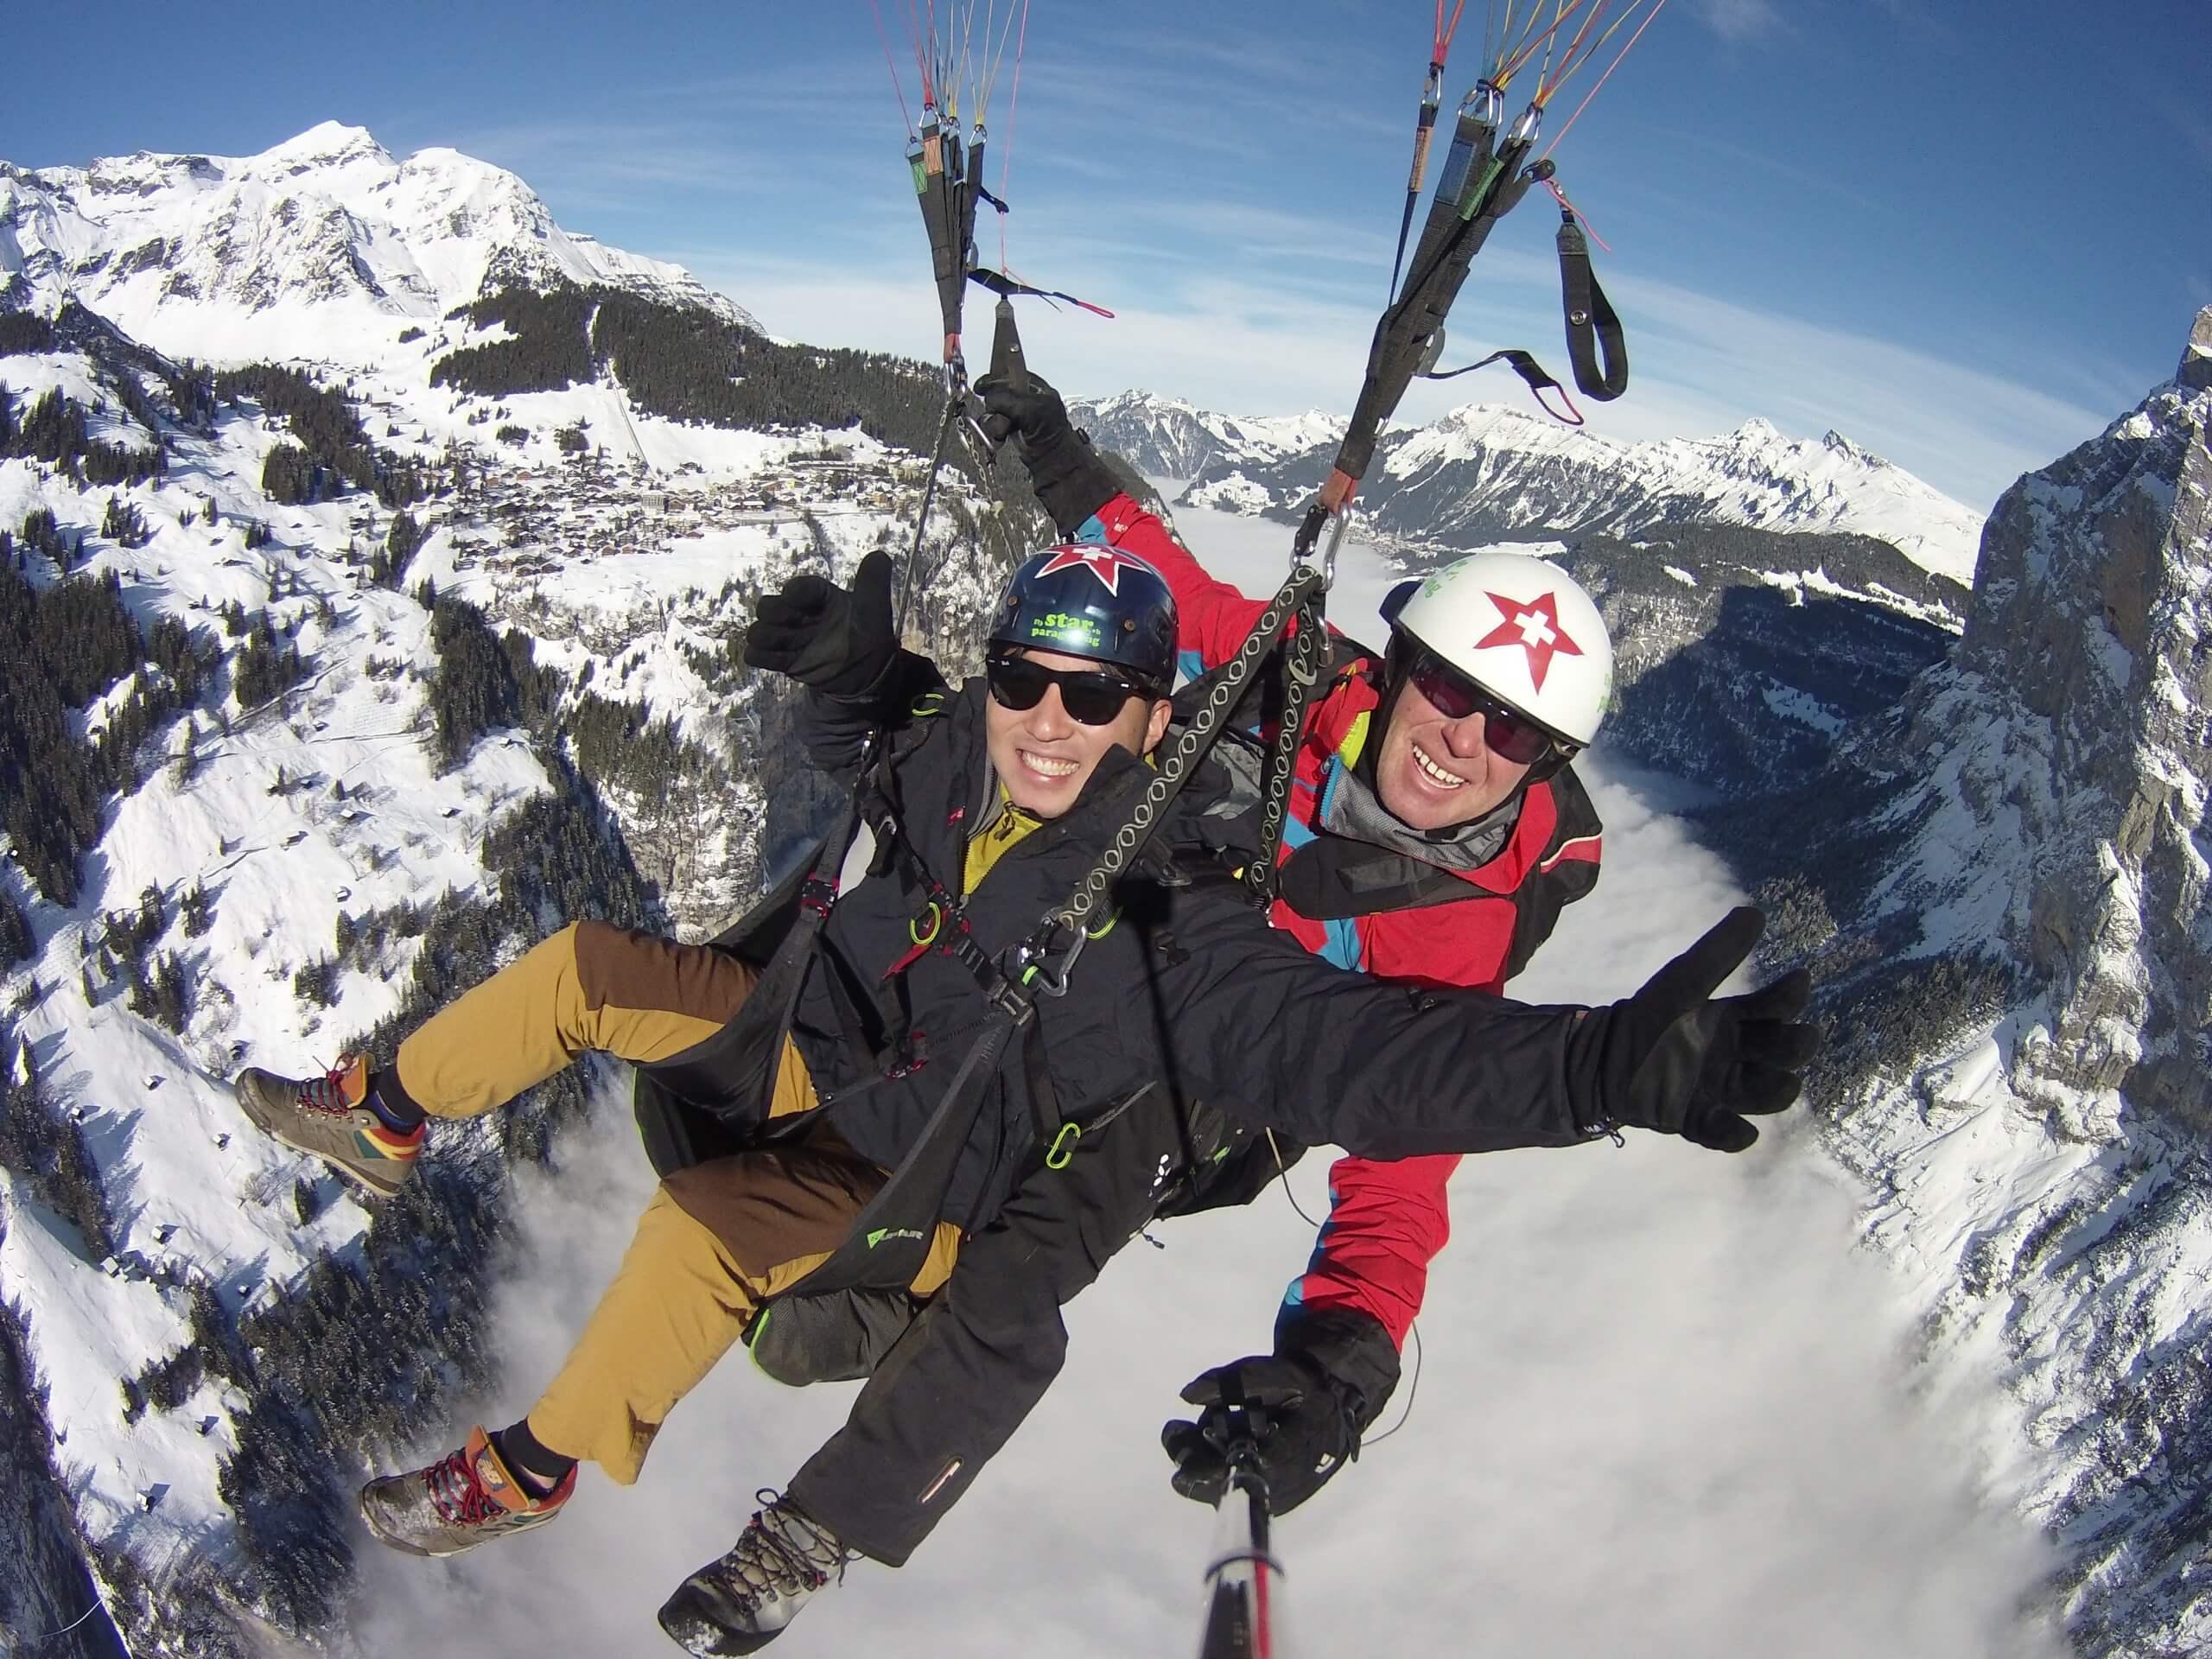 star-paragliding-panorama-berge-winter